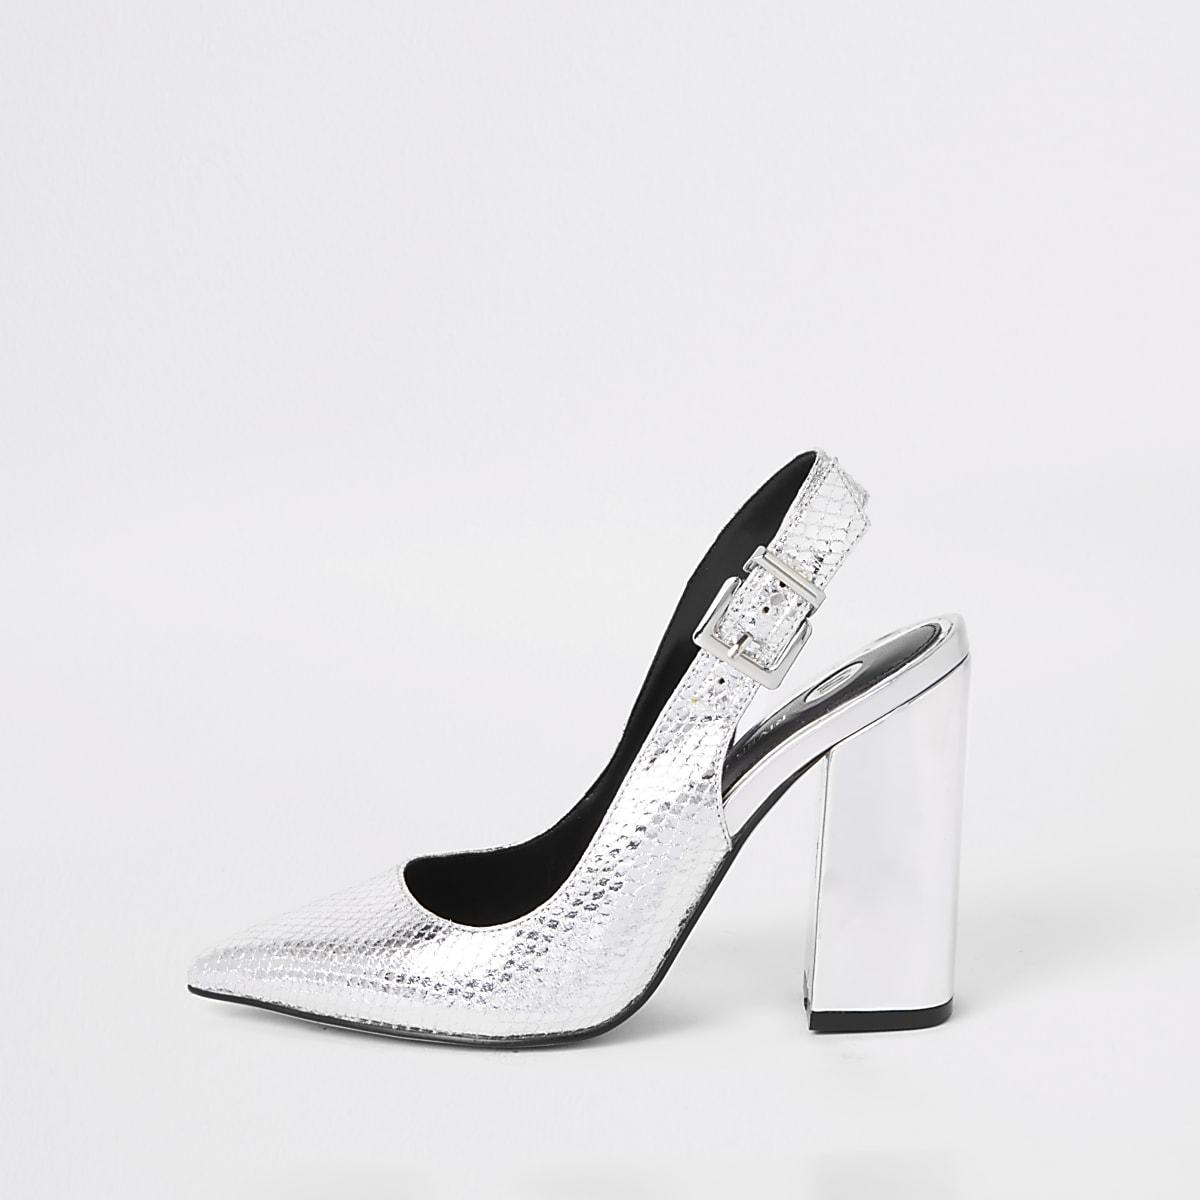 Silver block heel sling back pumps